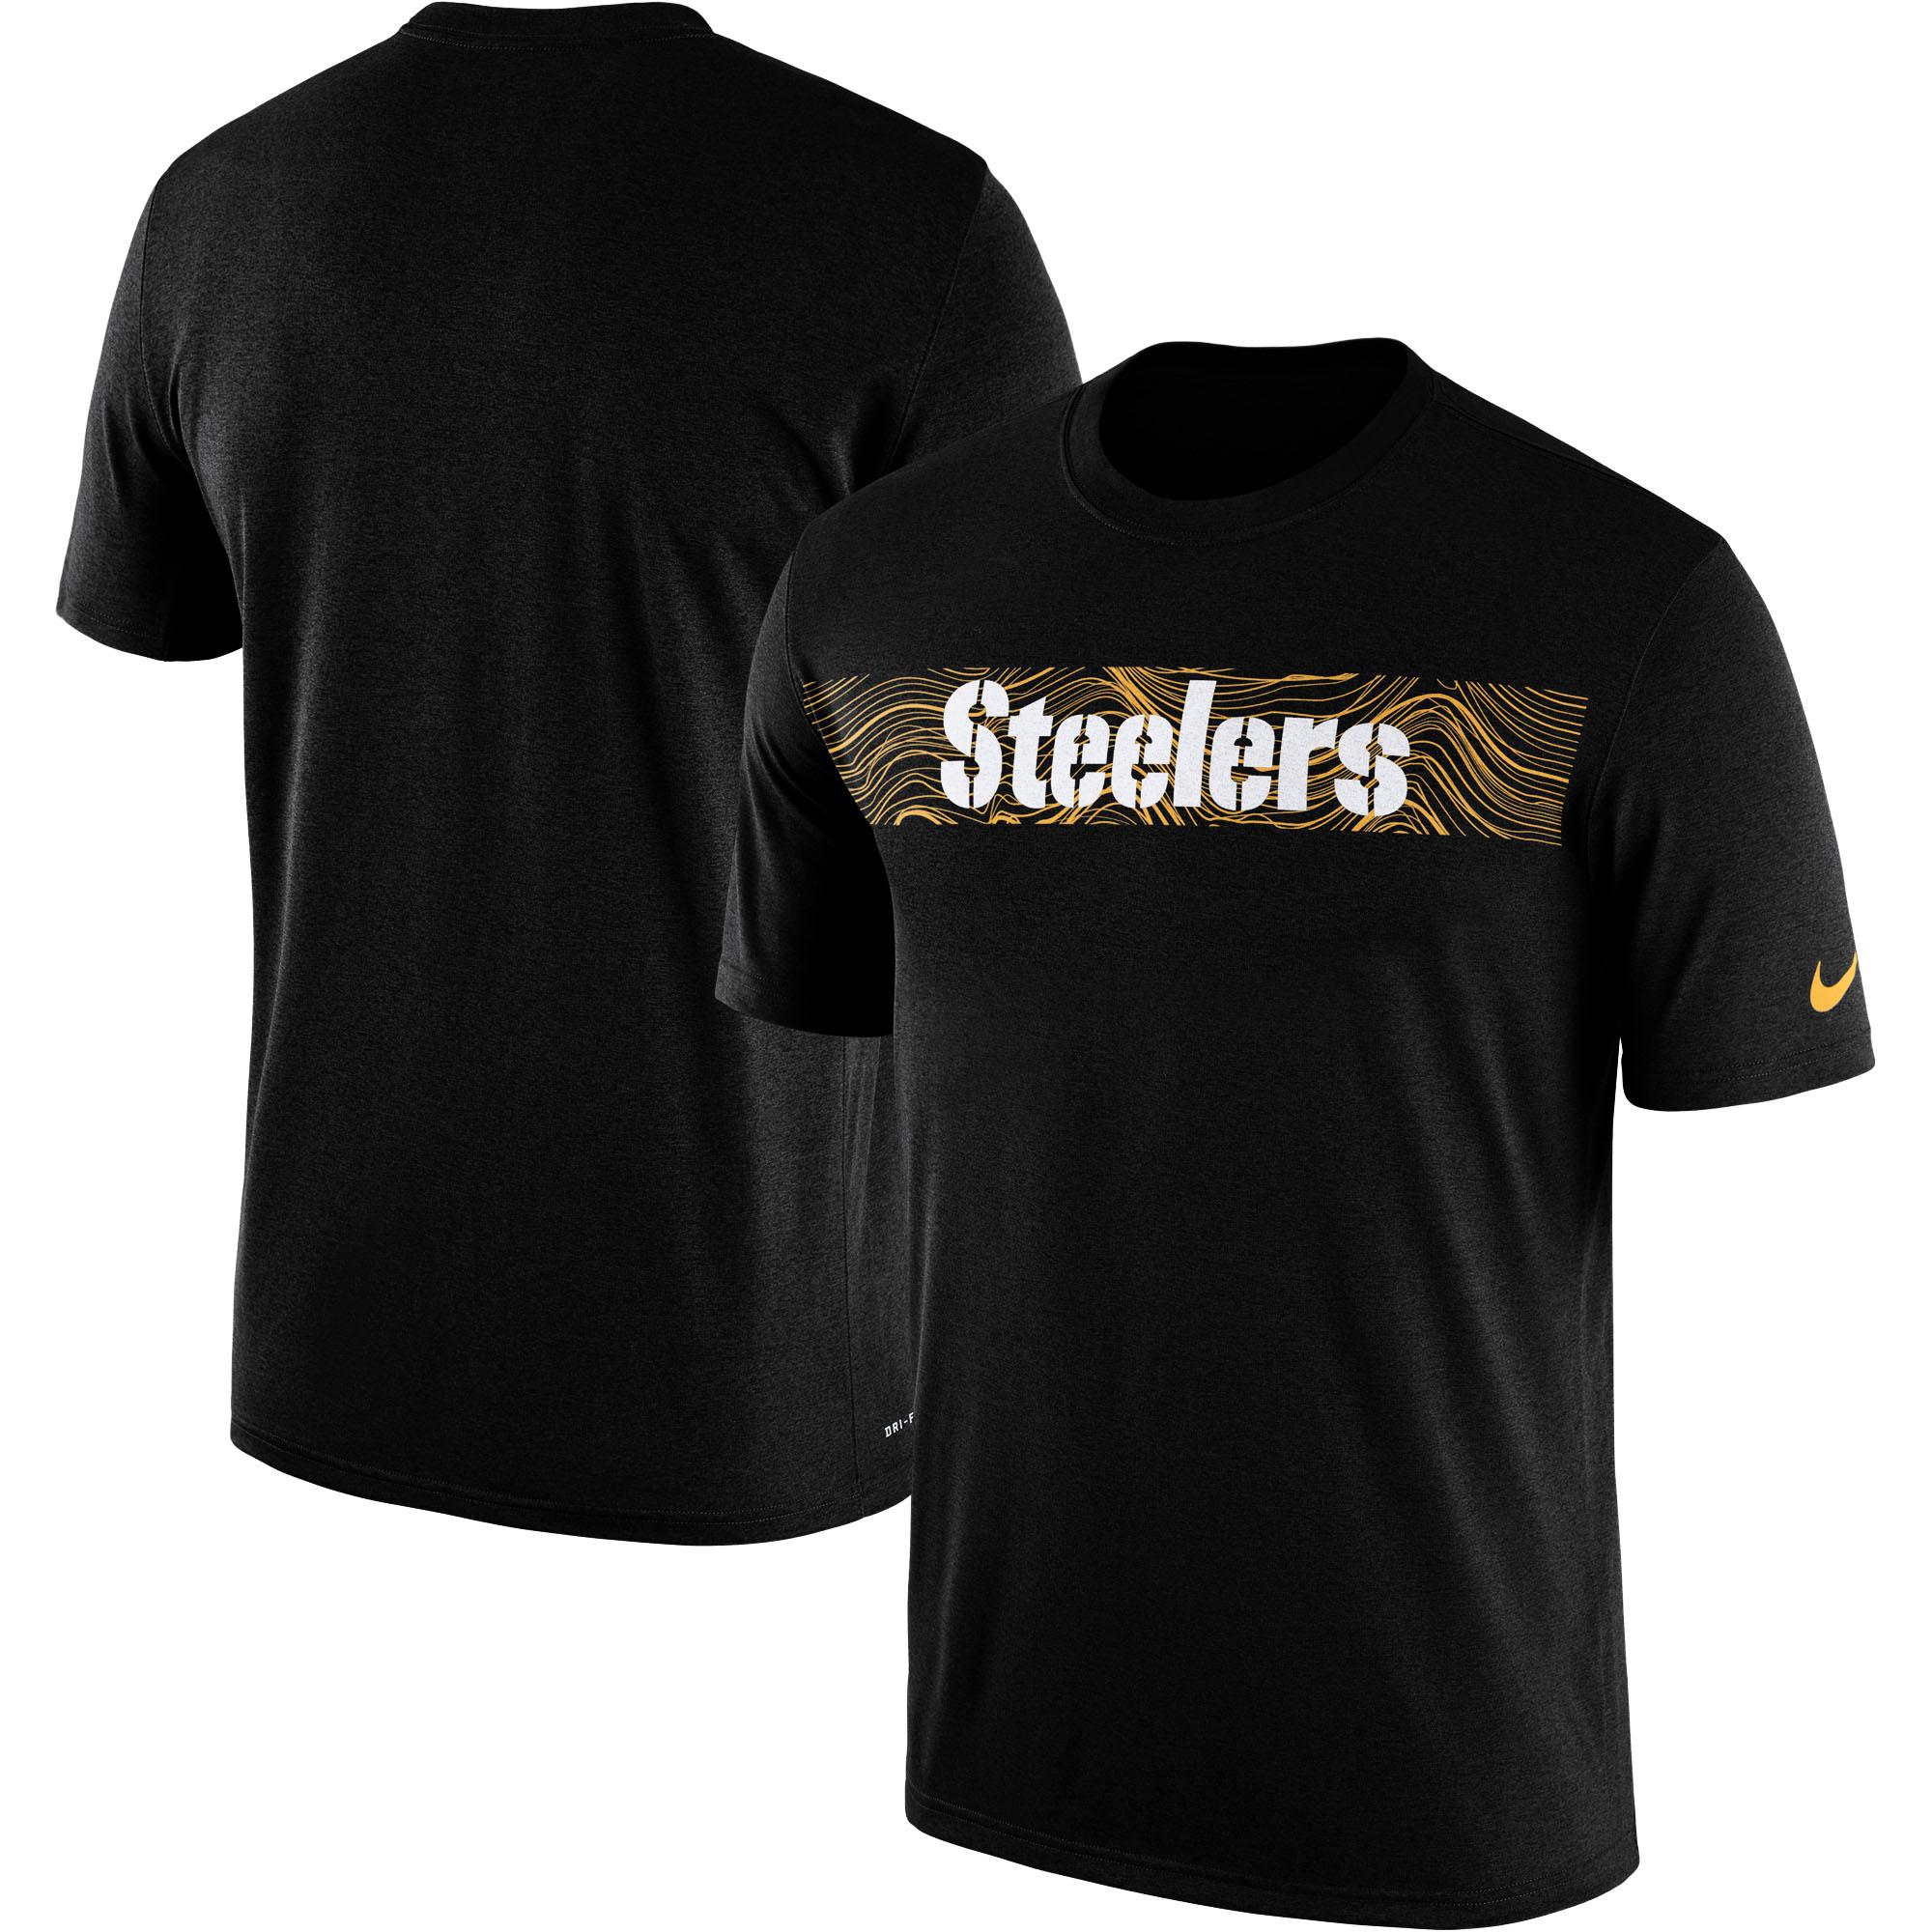 Pittsburgh Steelers Nike Sideline Seismic Legend Performance T-Shirt - Black